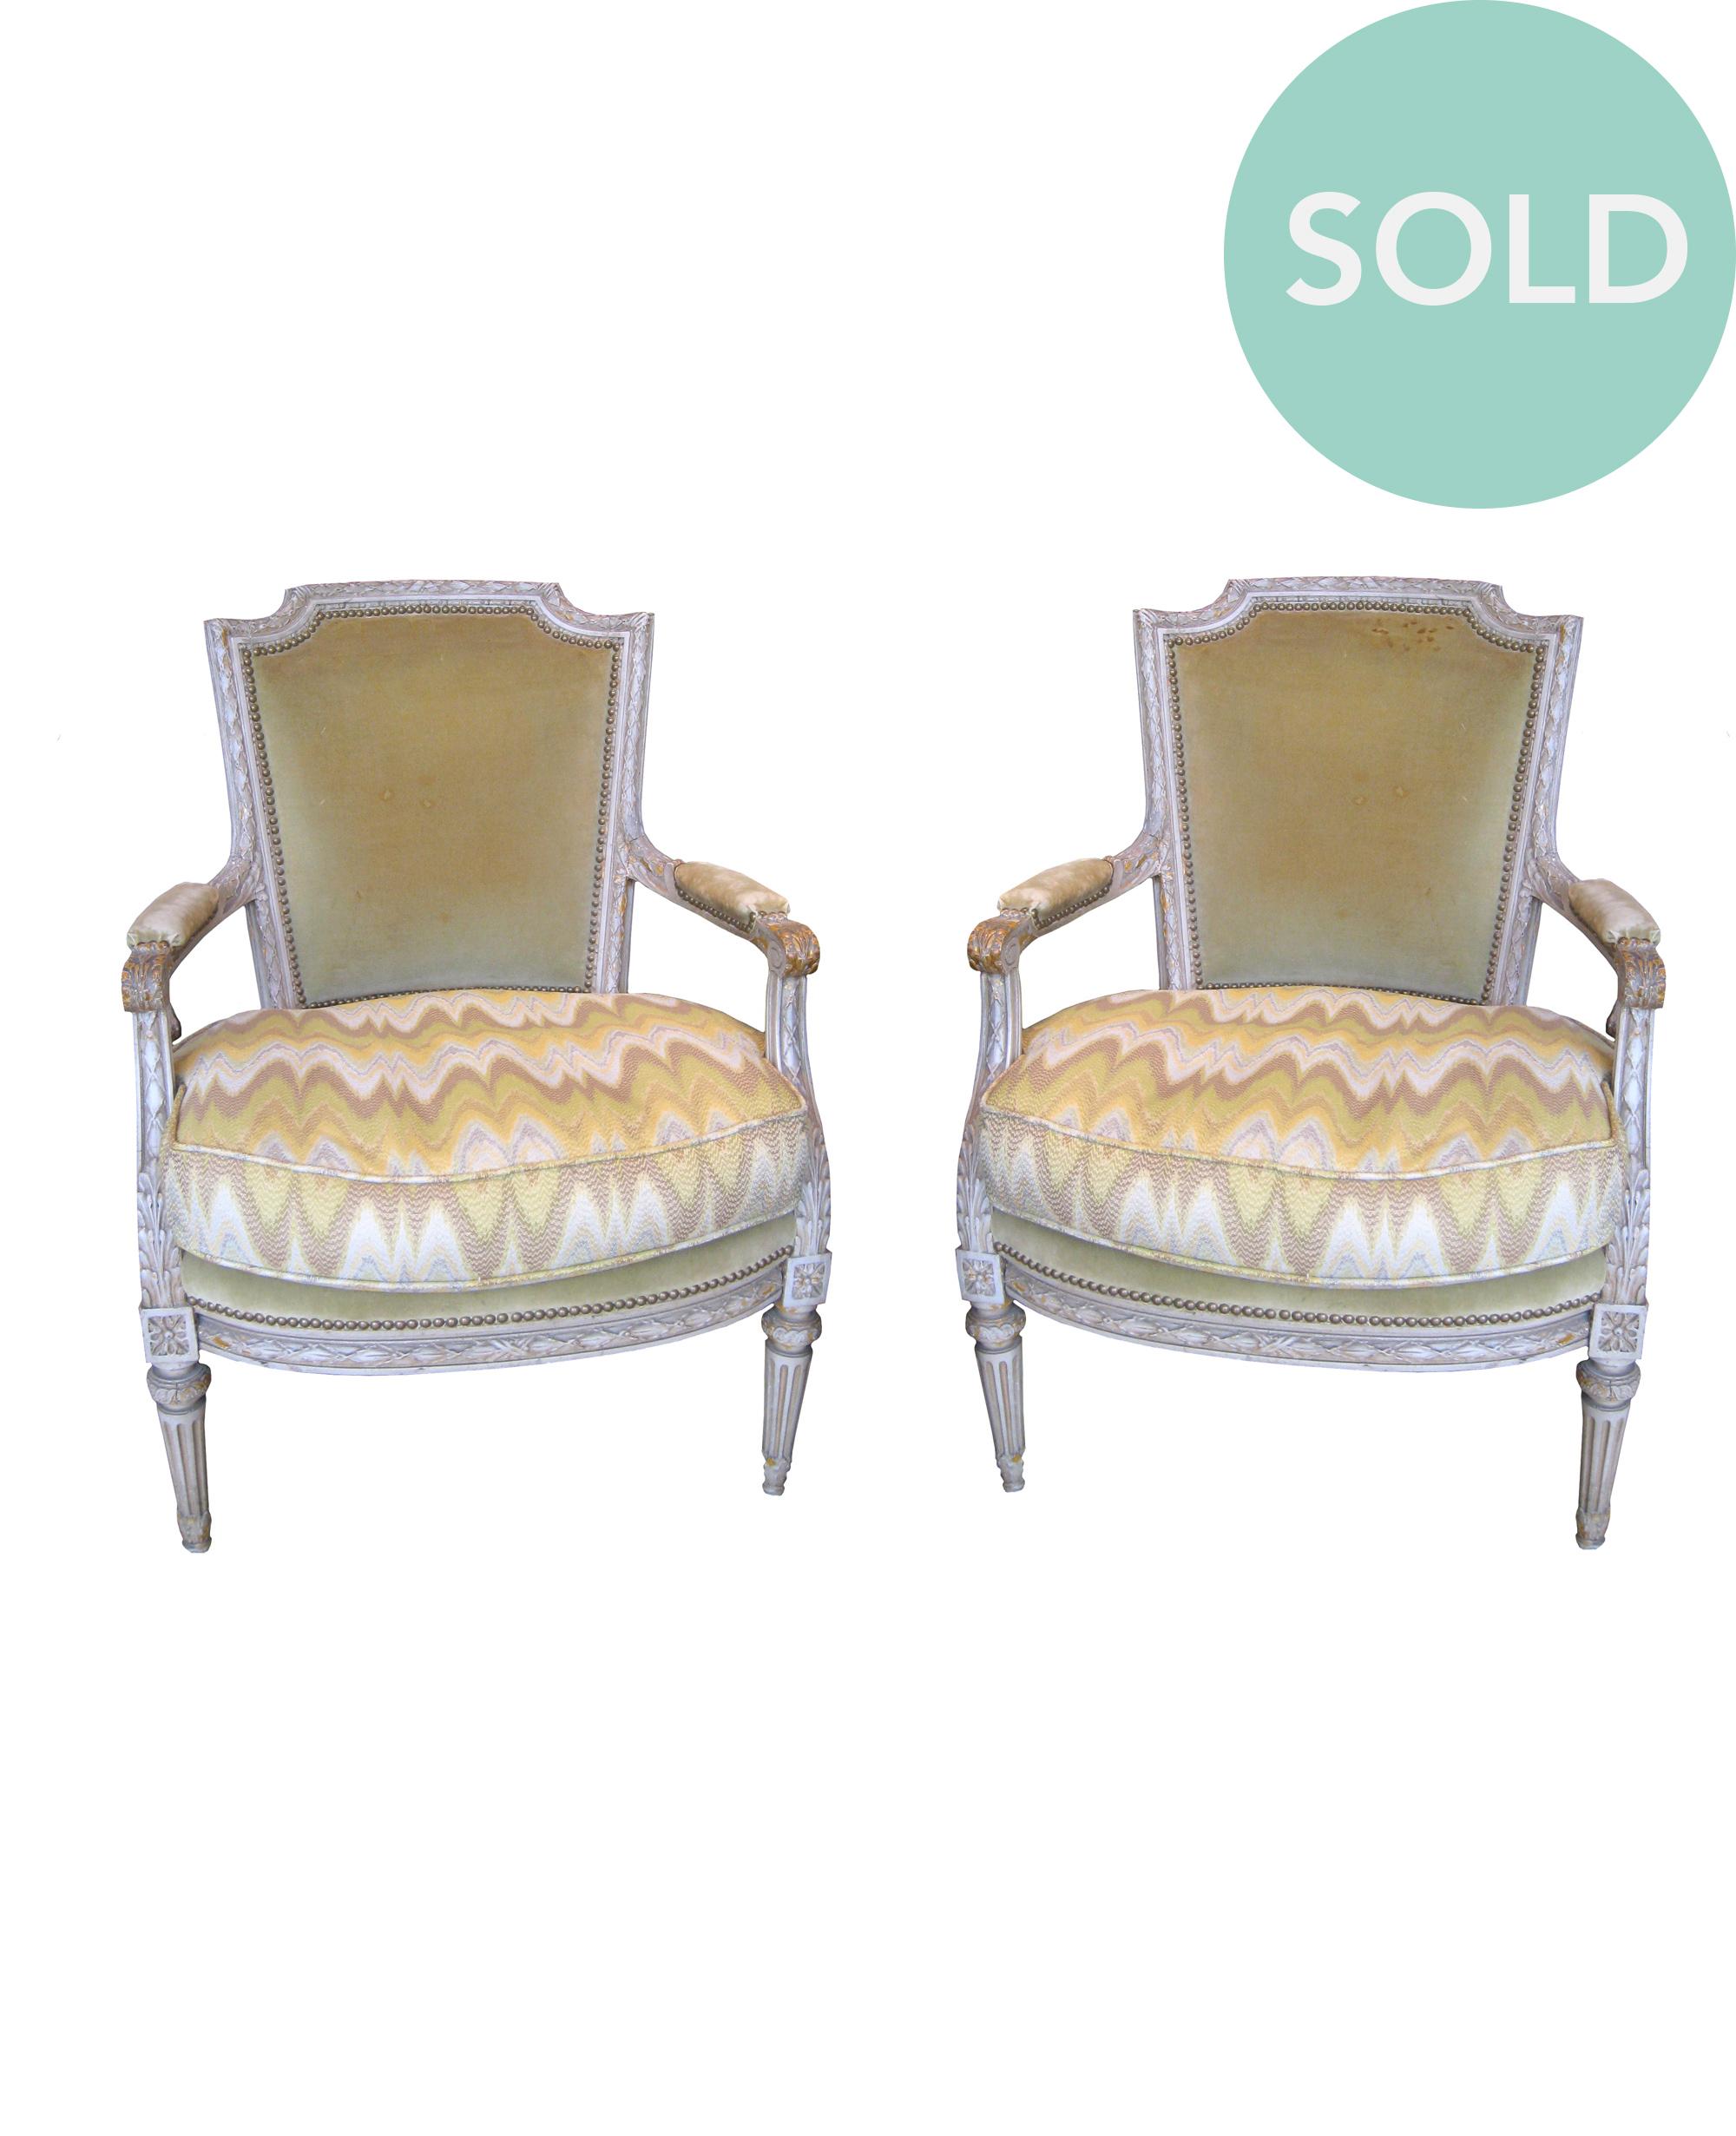 Antique french chairs - Antique French Chairs